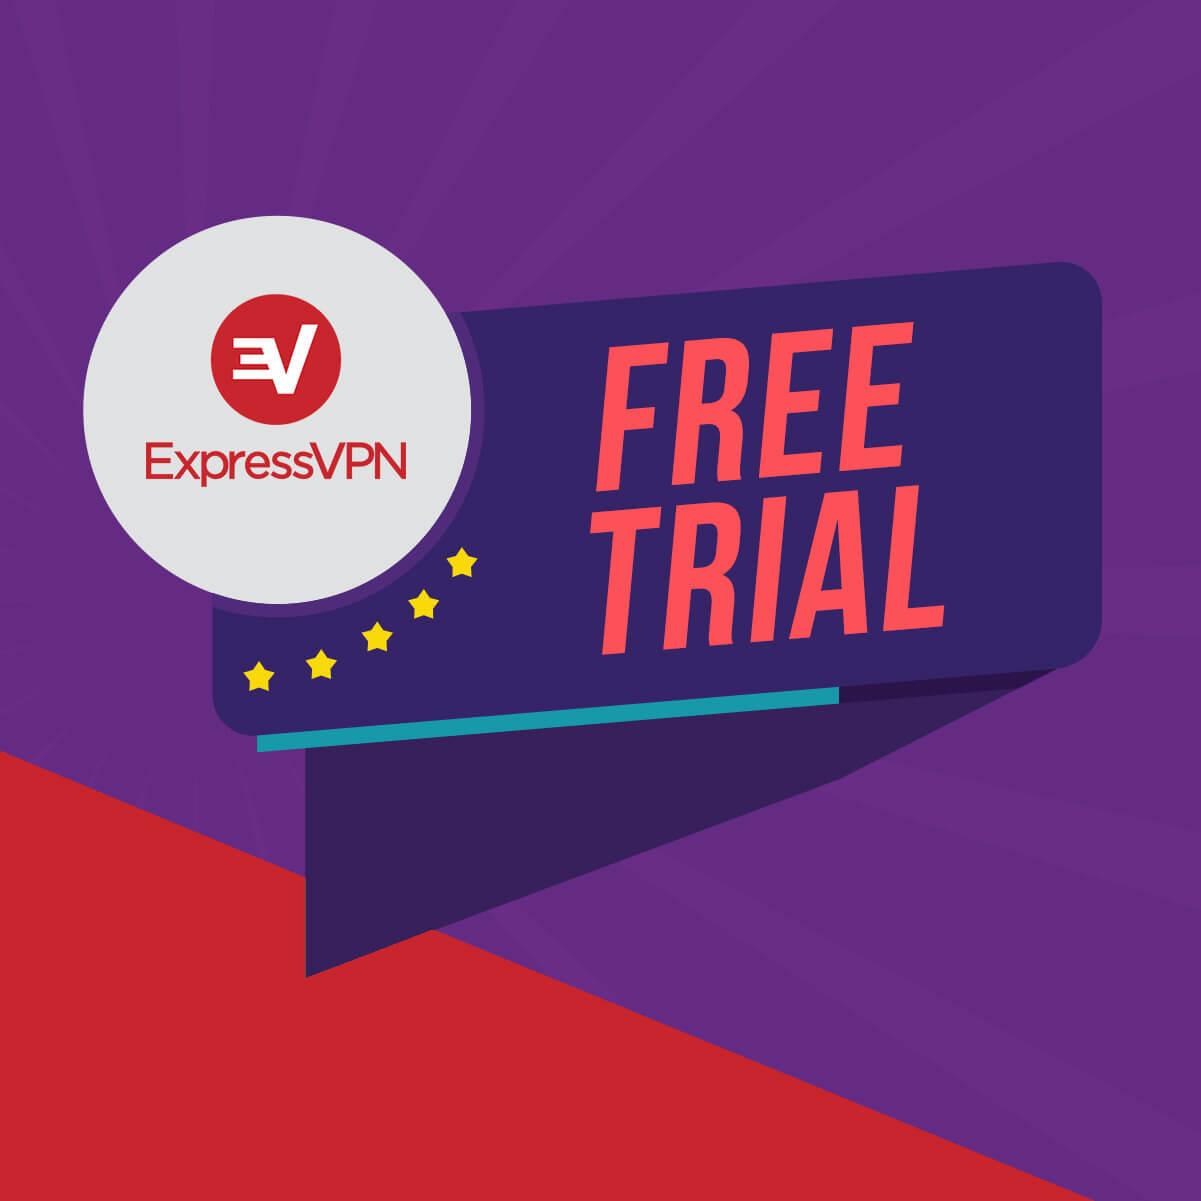 Get Expressvpn Free Trial Now Guaranteed 2021 Hack